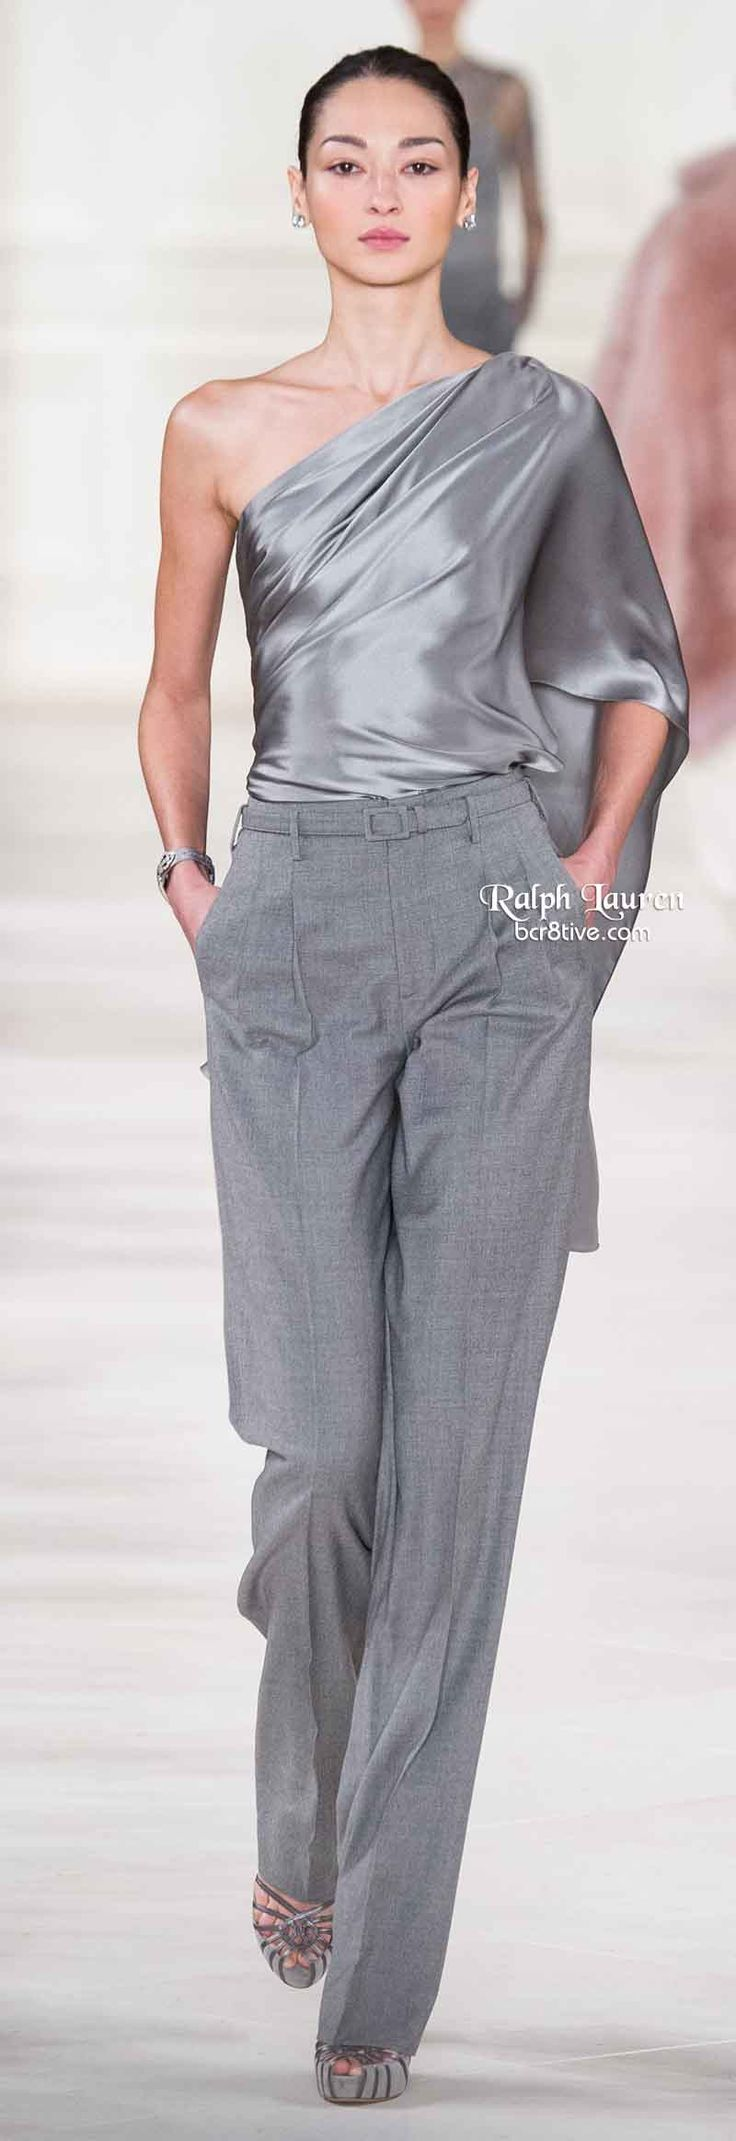 Ralph Lauren Fall 2014 v - Pantalón.